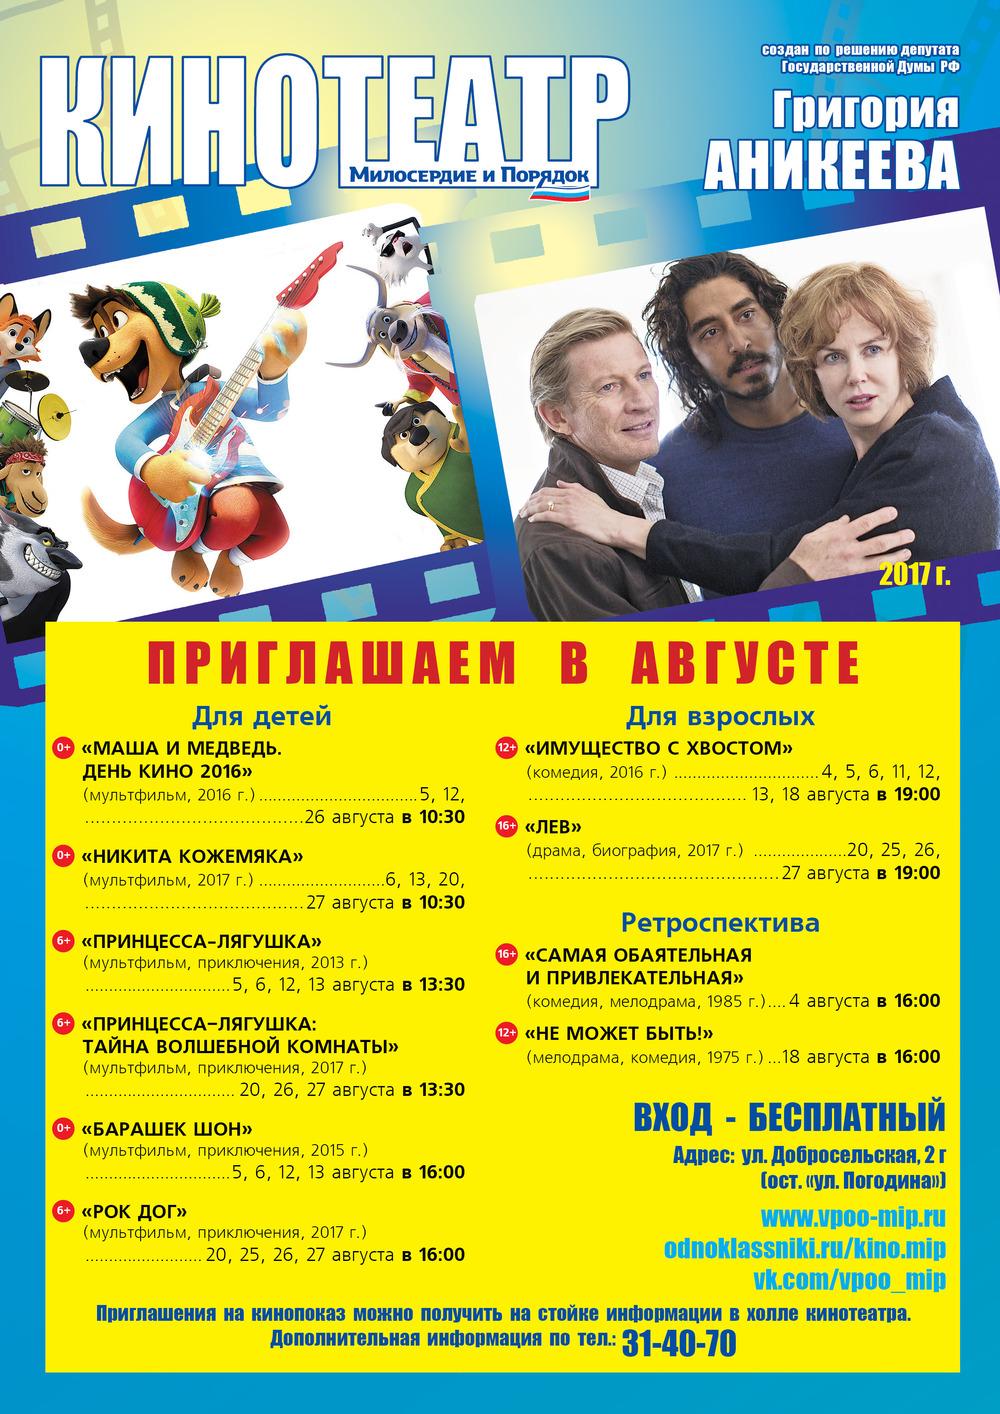 Театр волкова афиша на август 2017 афиша на ноябрь тамбов концерта